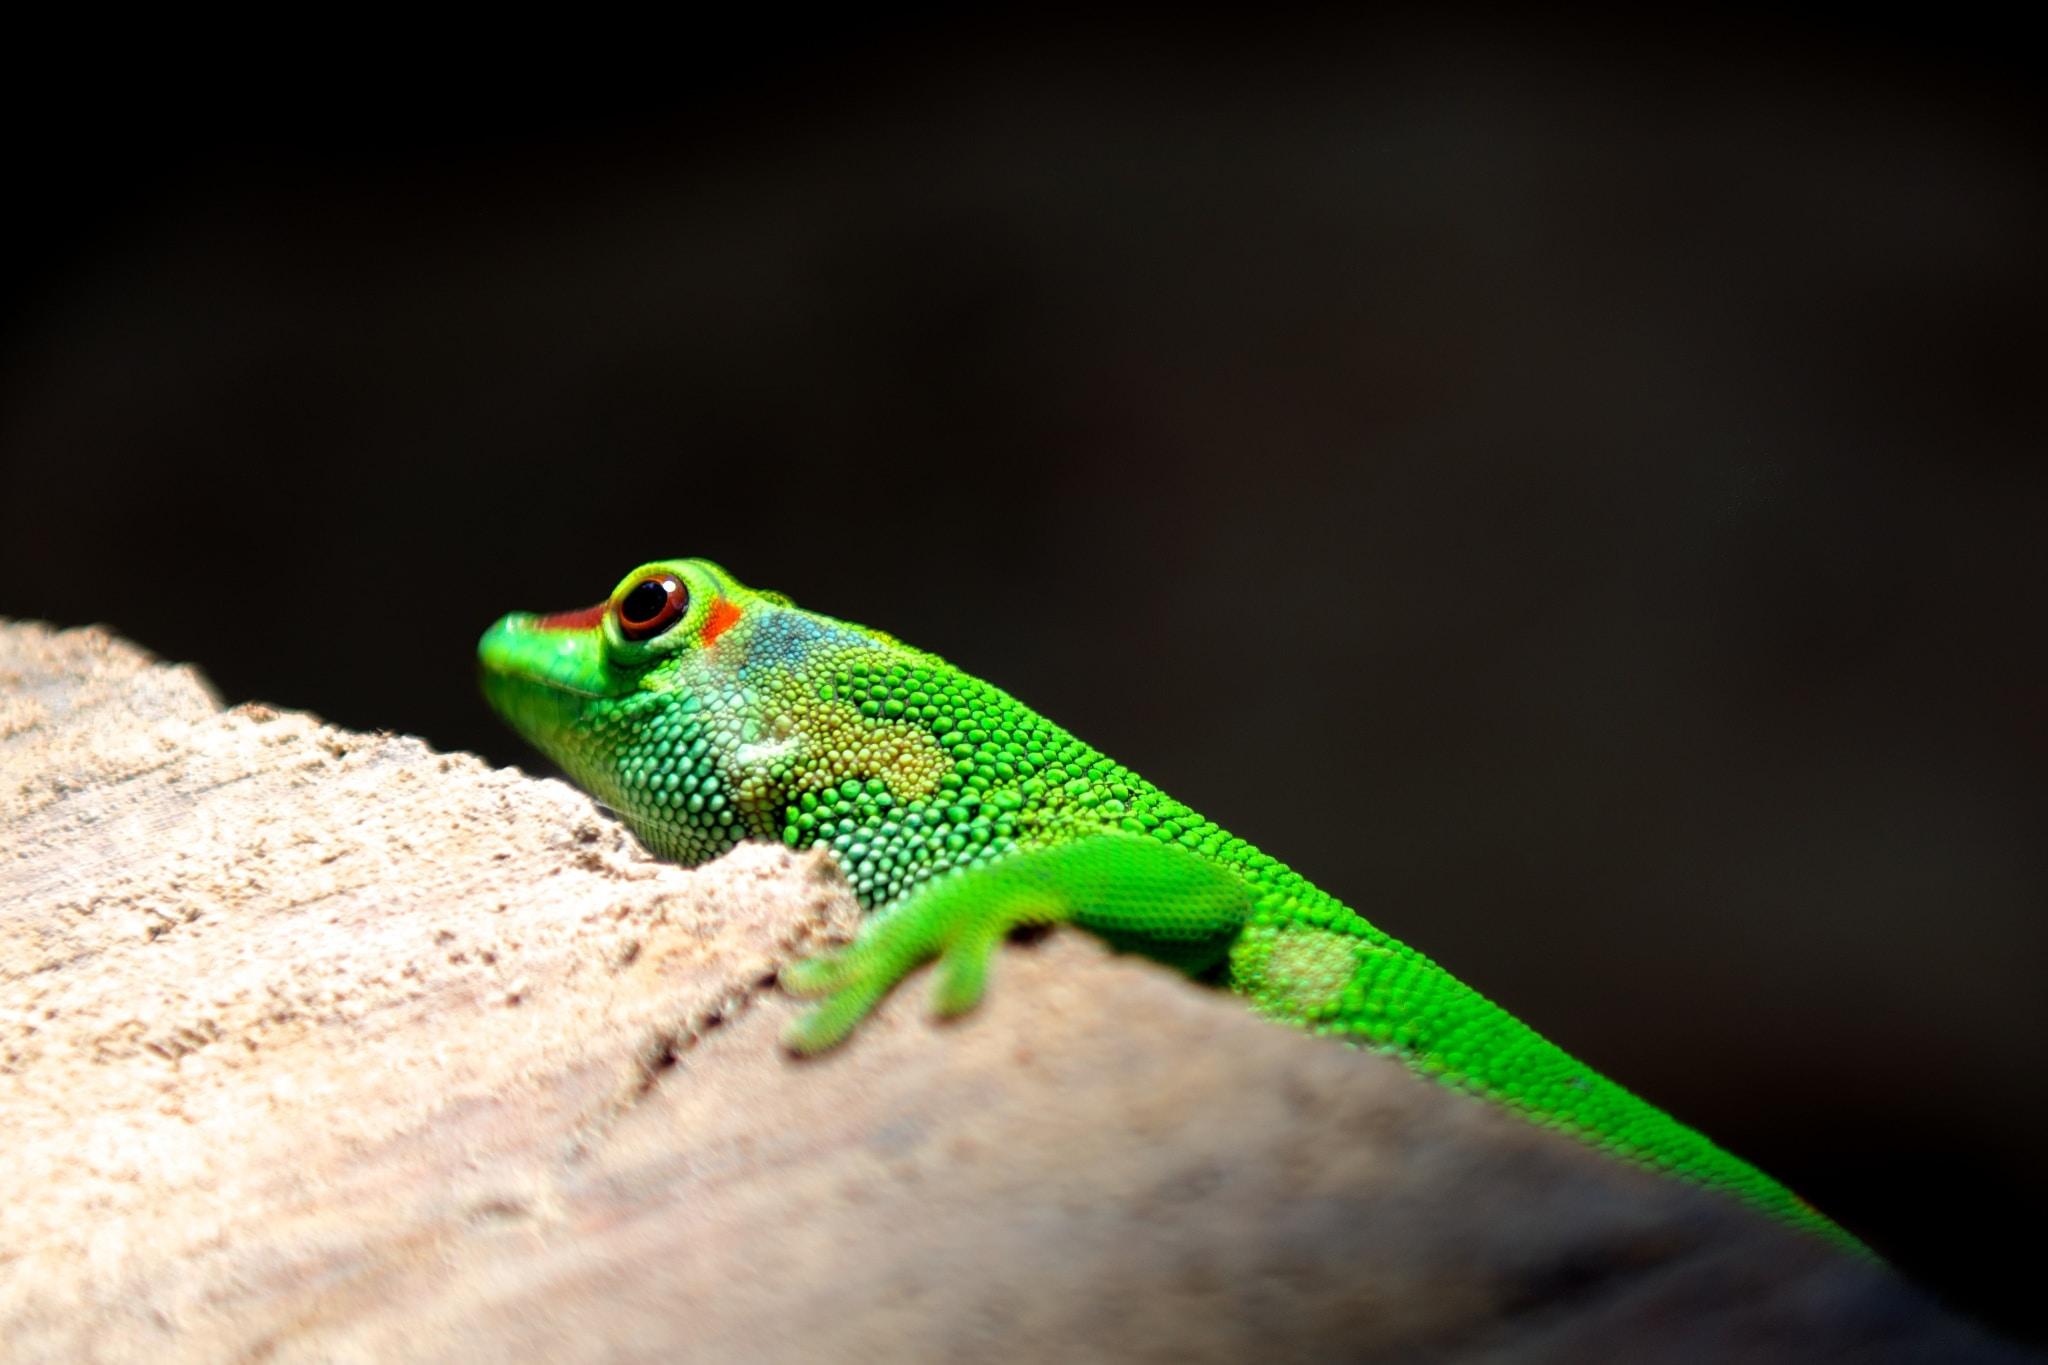 selective focus photography of lizard